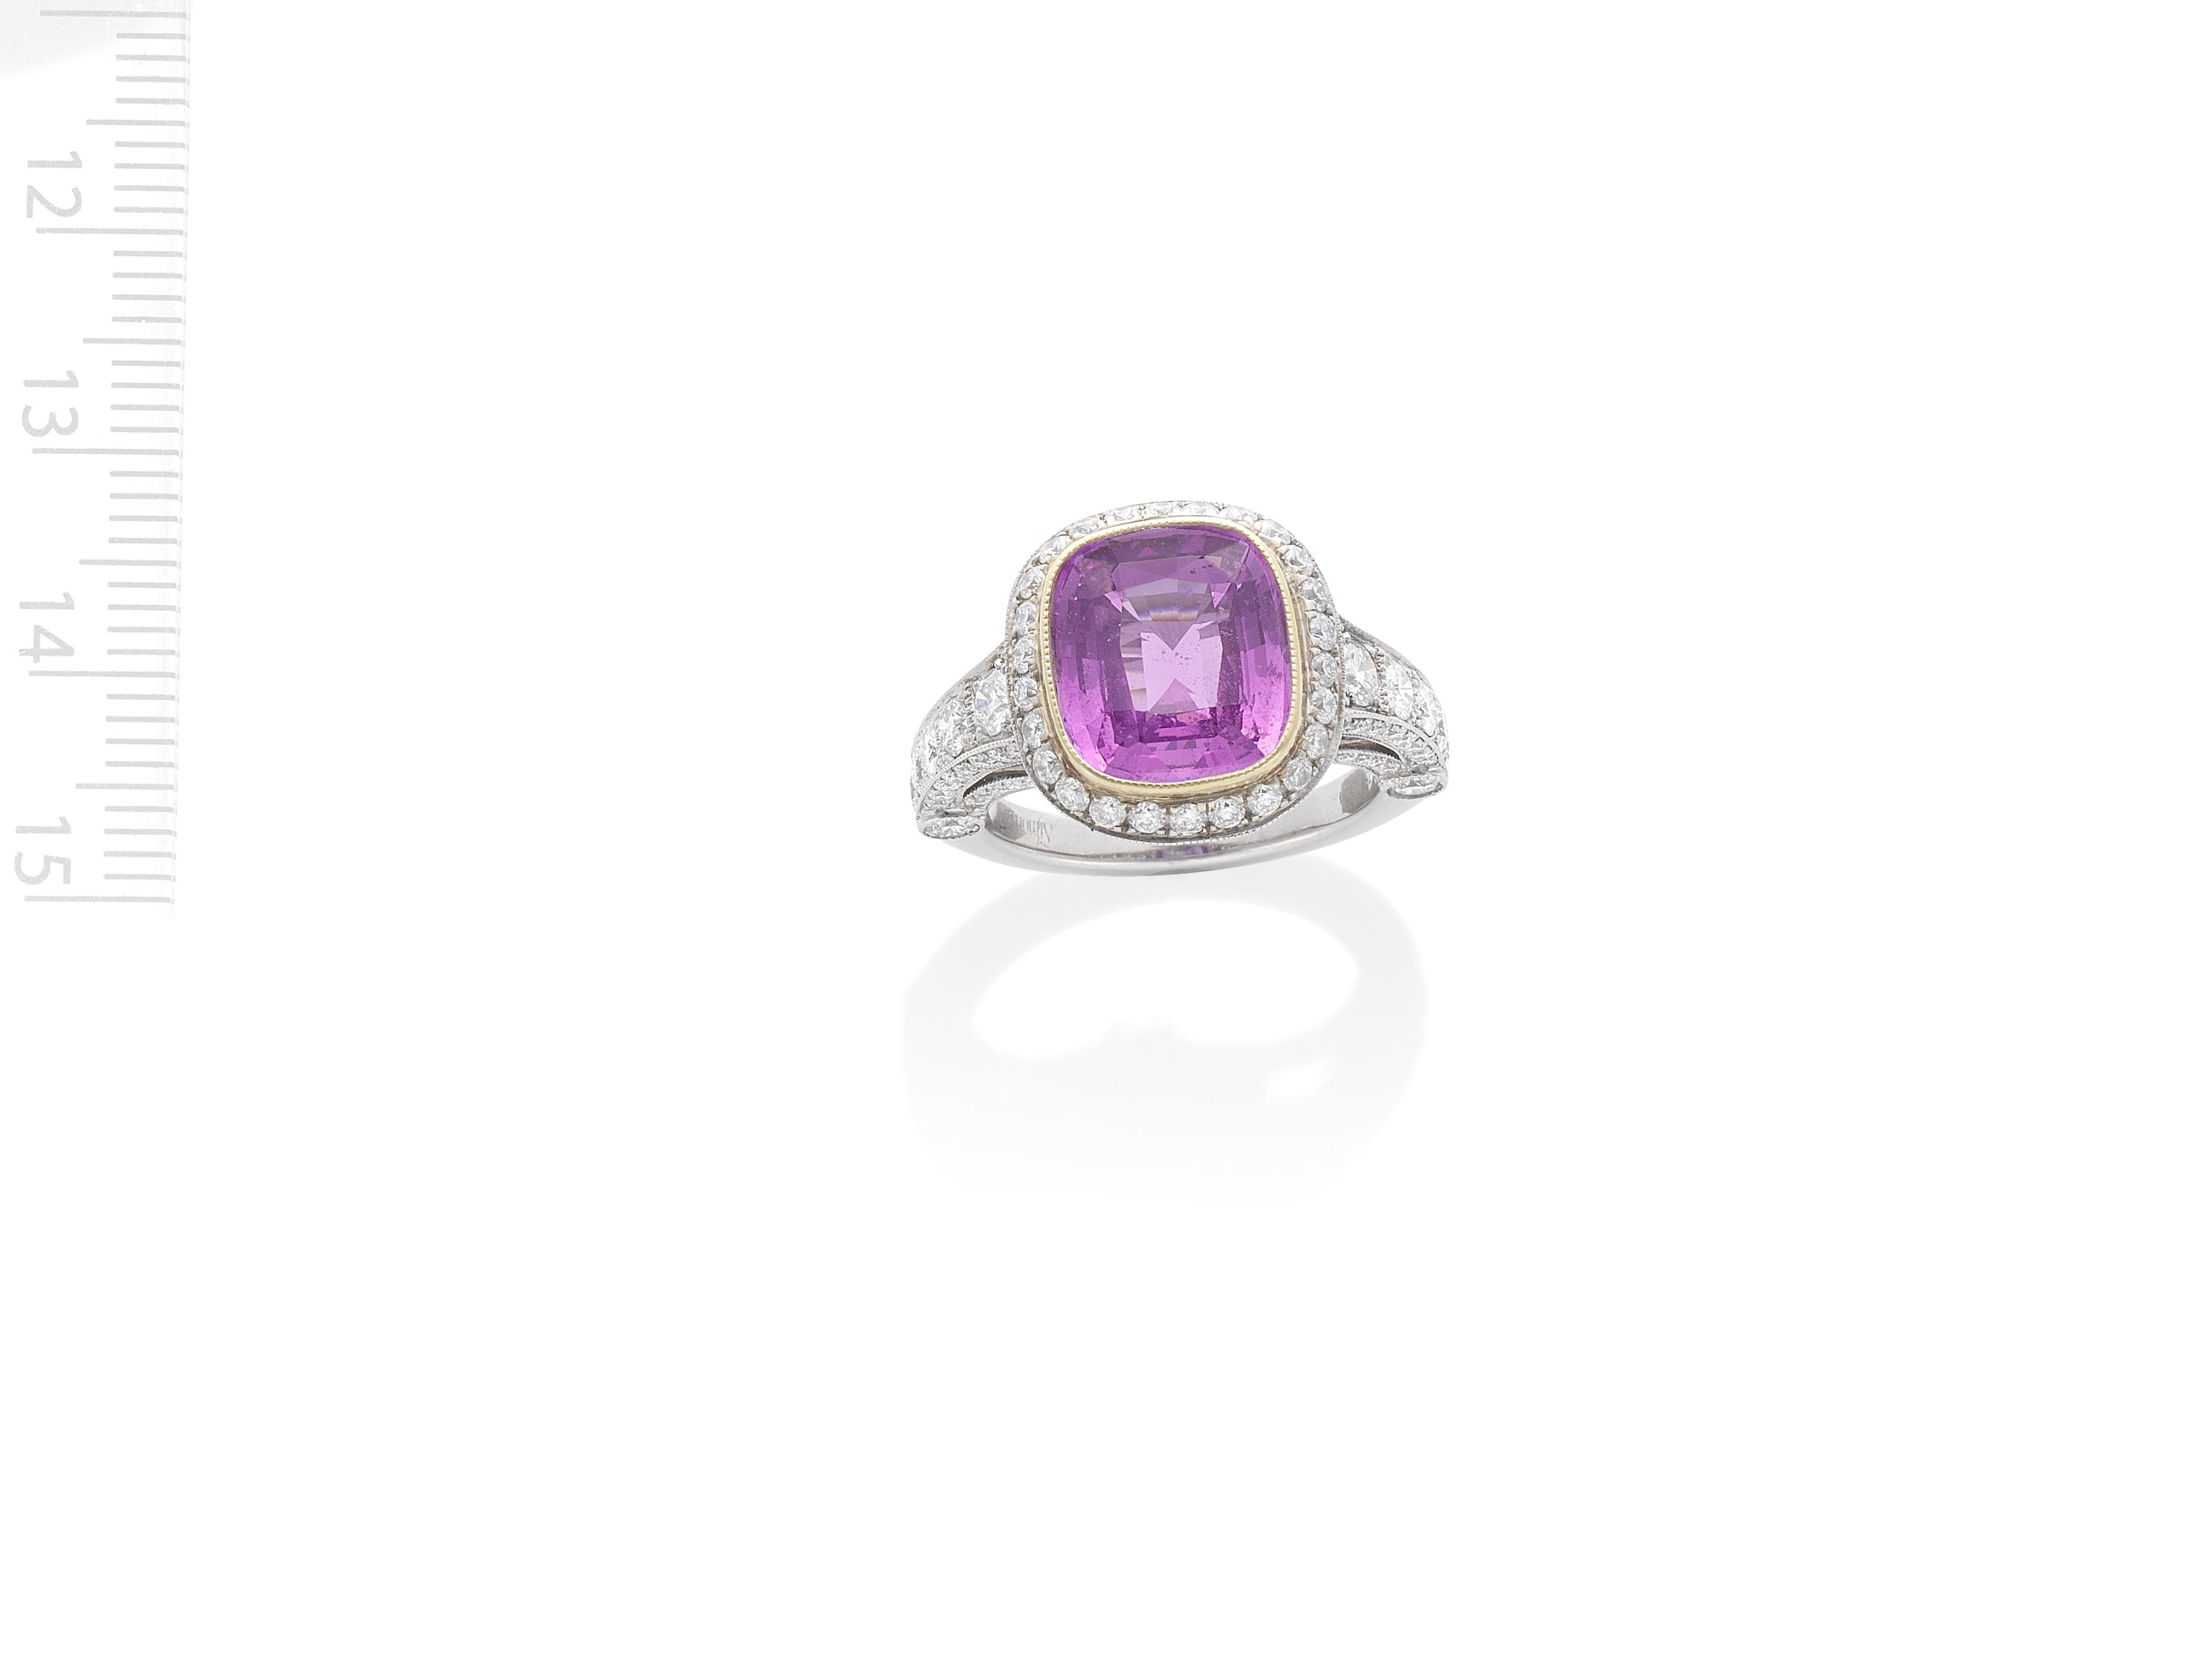 SIMON G: PINK SAPPHIRE AND DIAMOND RING